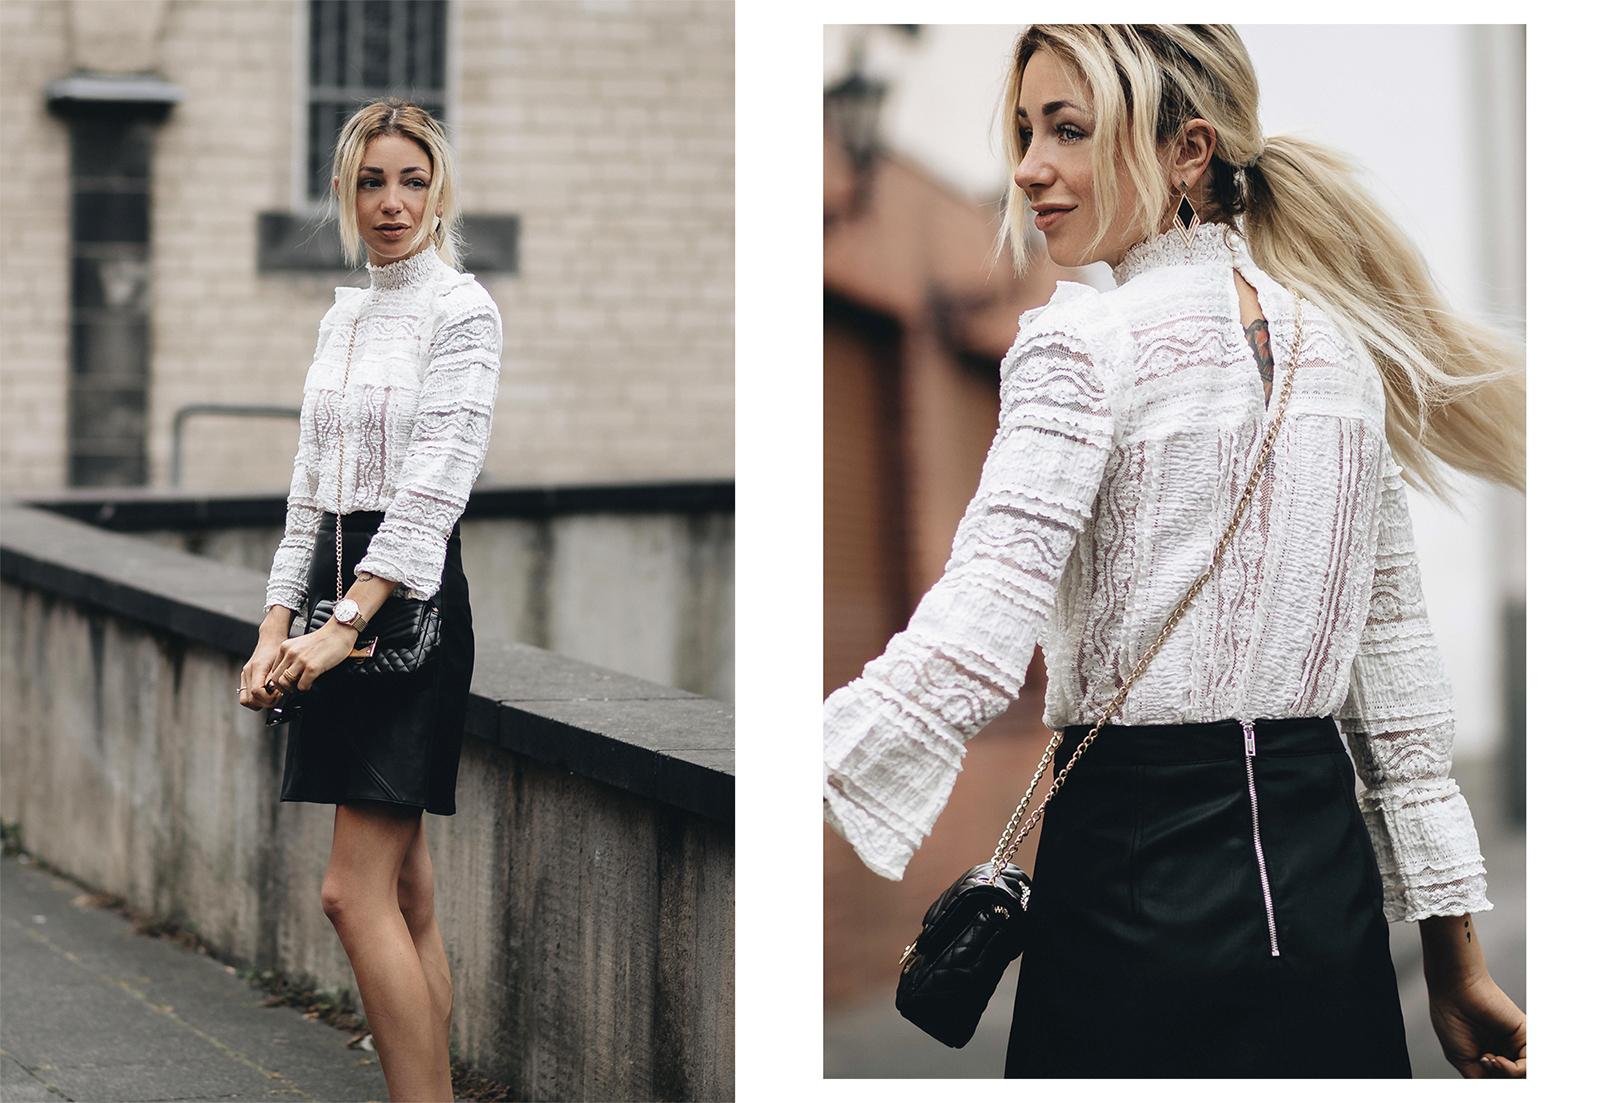 influencer-blogger-fashionblog-modeblog-koeln-instagram-style-2_web